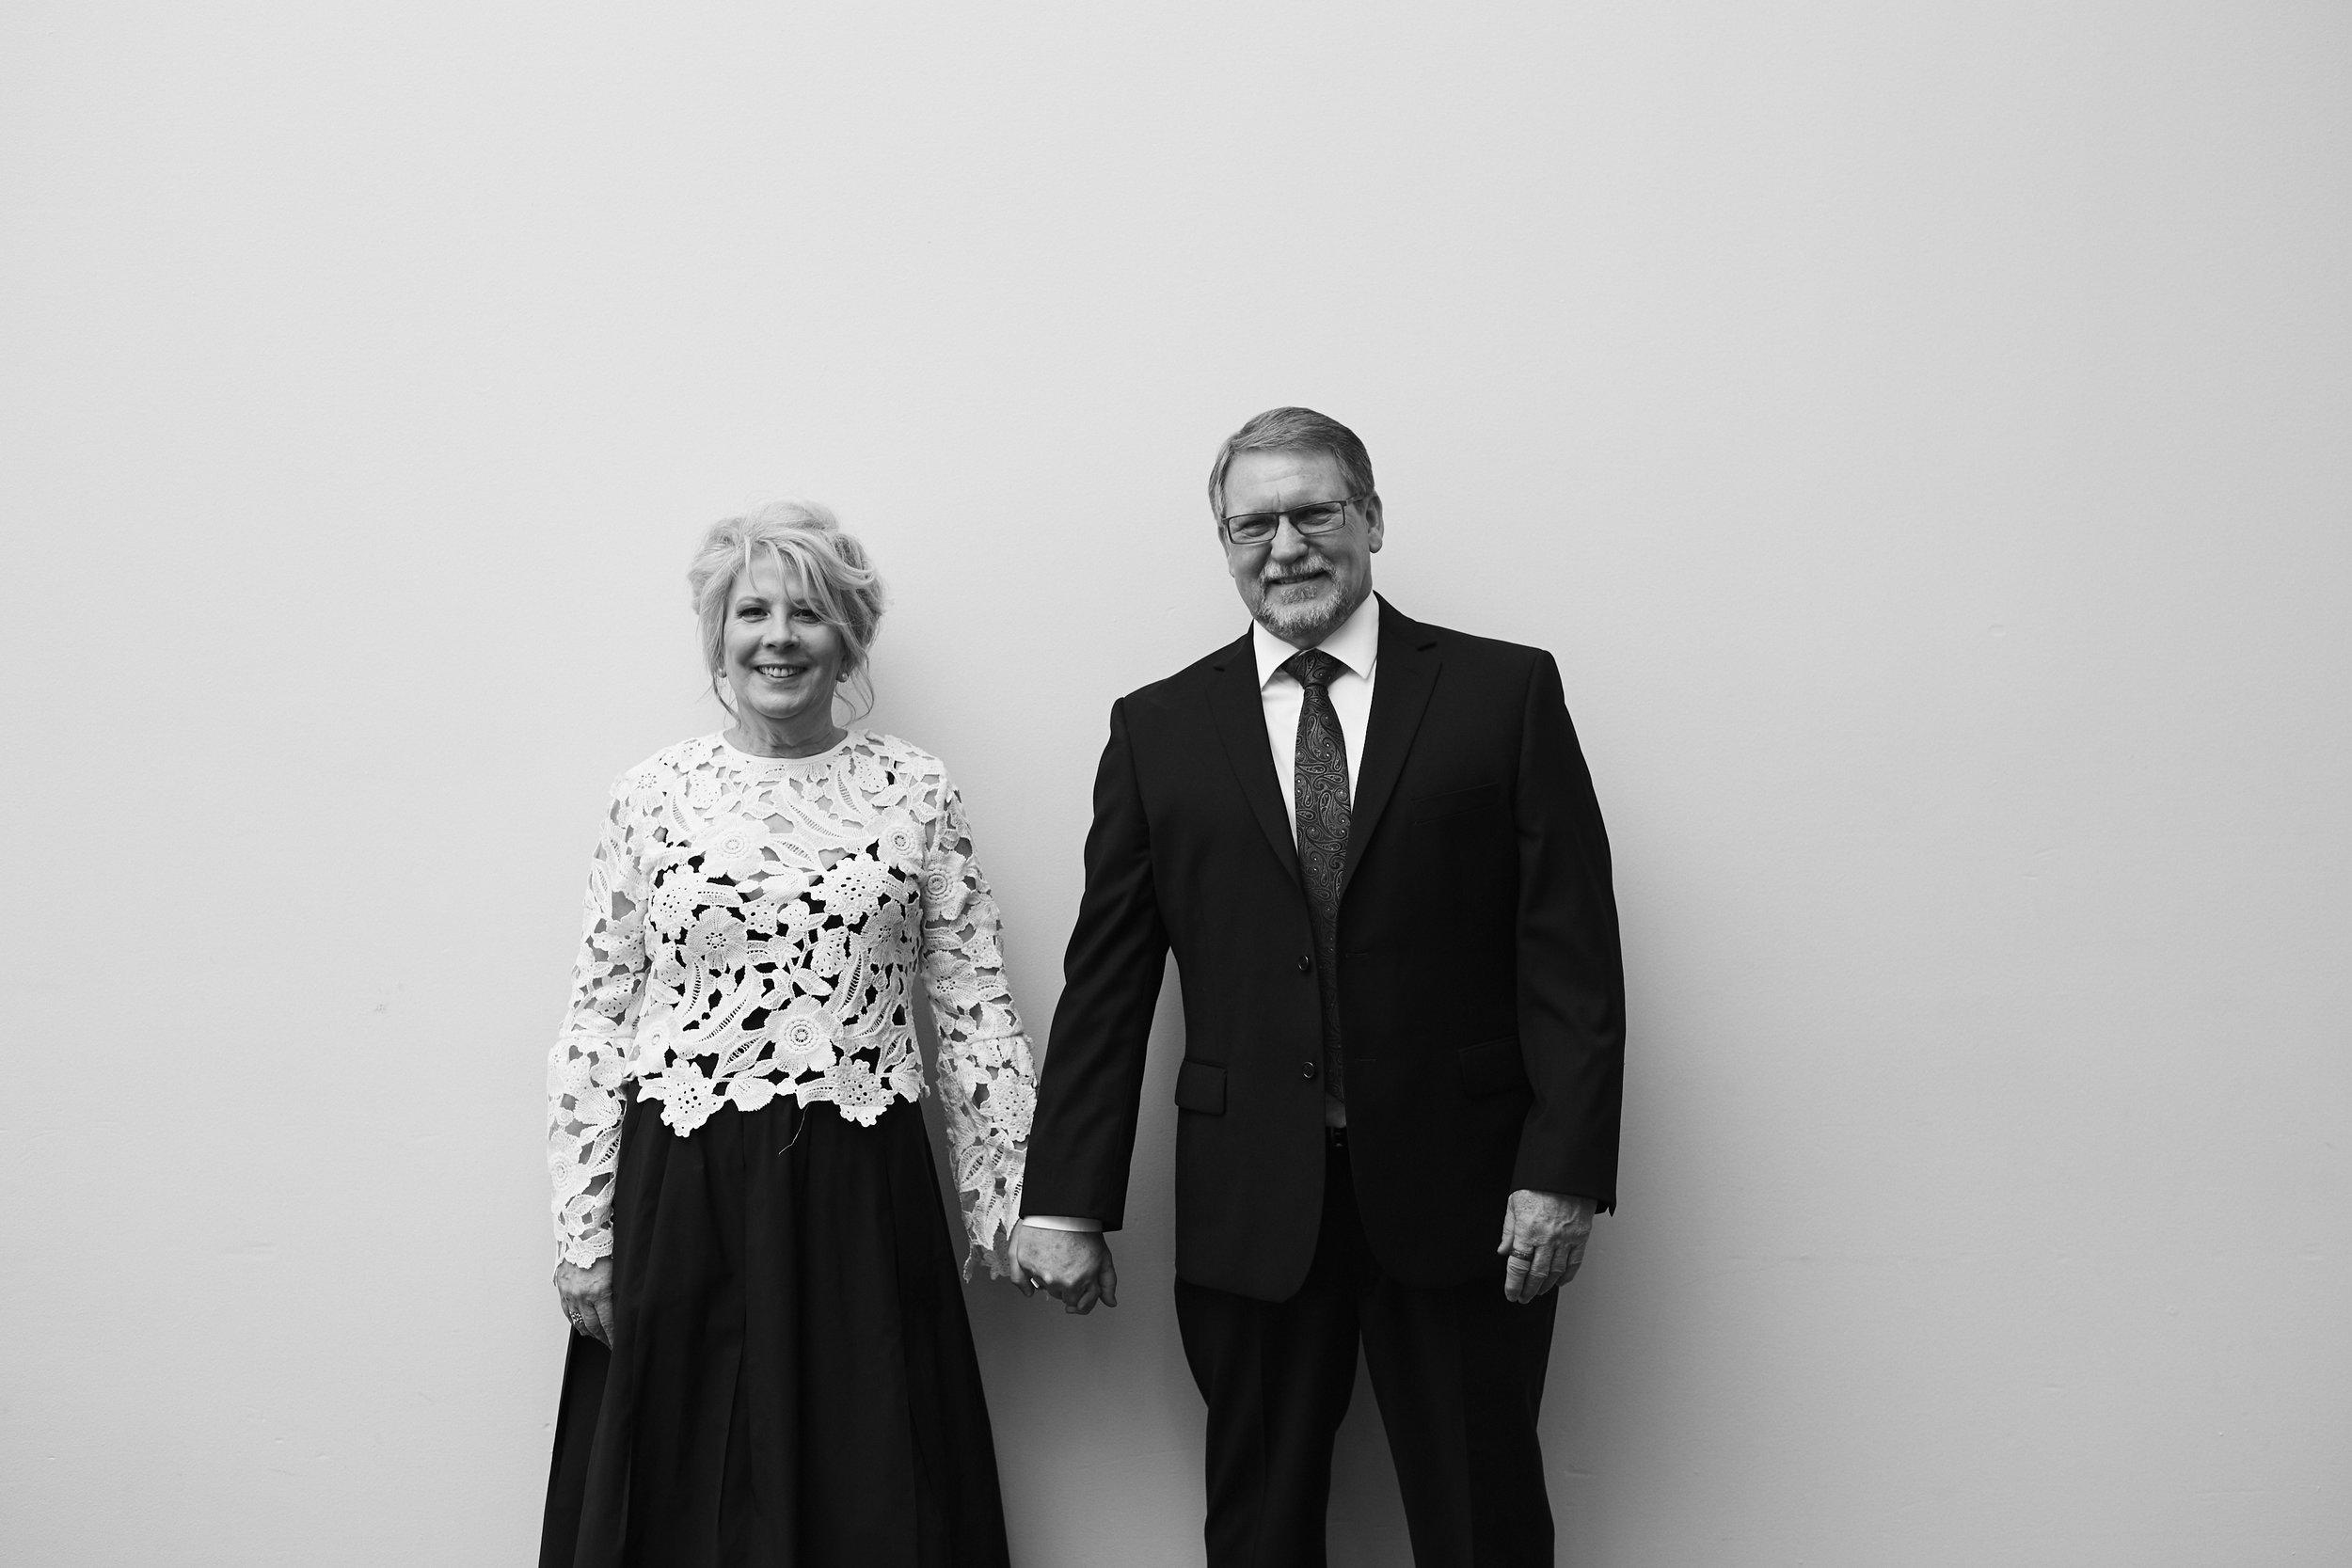 Sue & Dave - benromangphoto - 6I5A7025.jpg